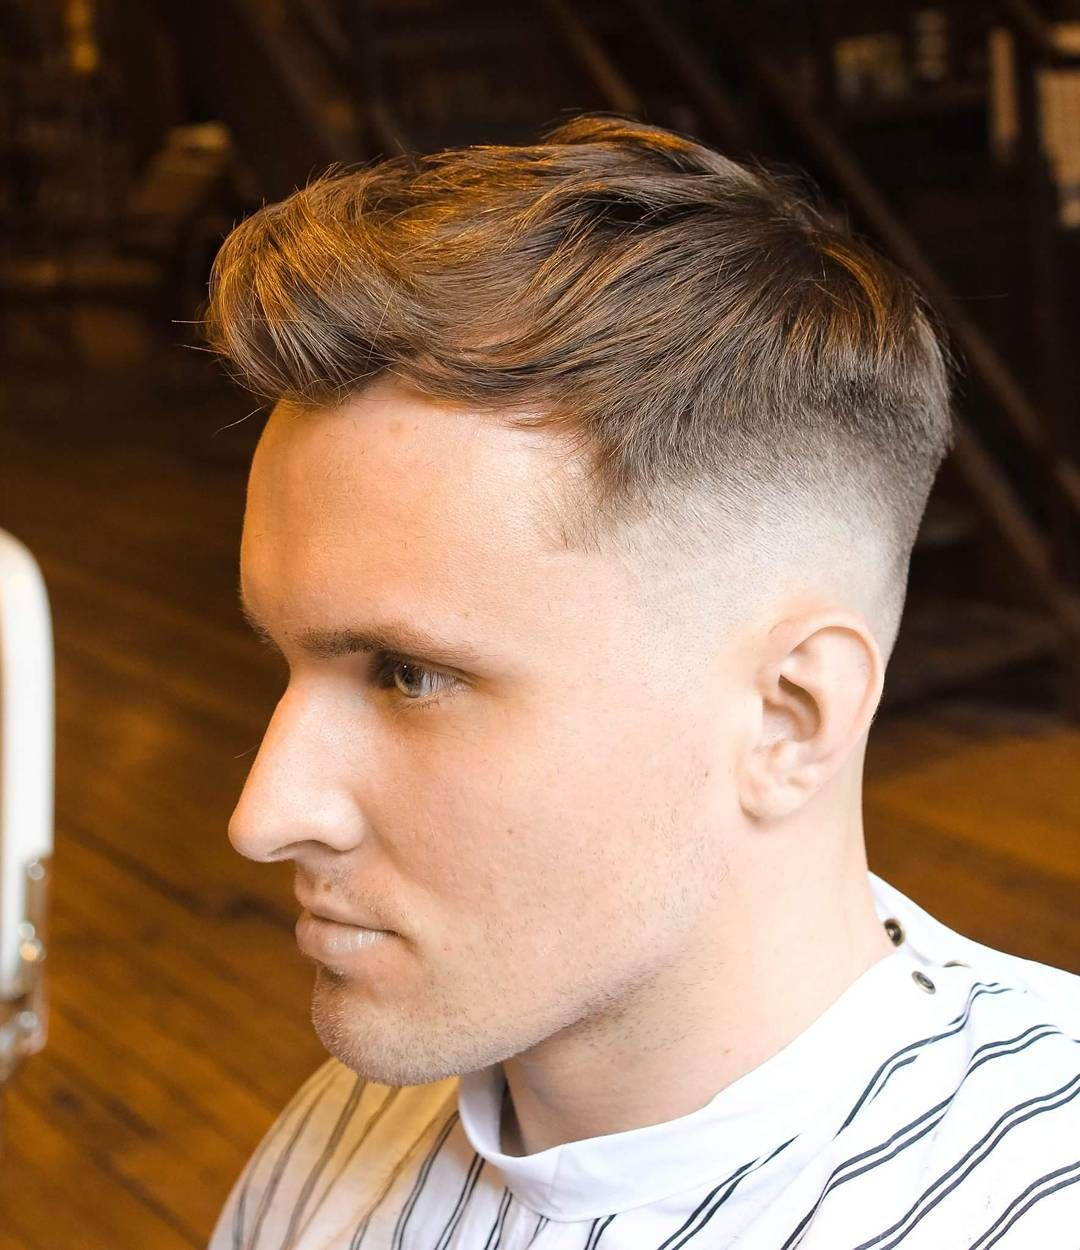 Mens haircuts undercut top haircuts for men  guide  haircuts undercut and men undercut